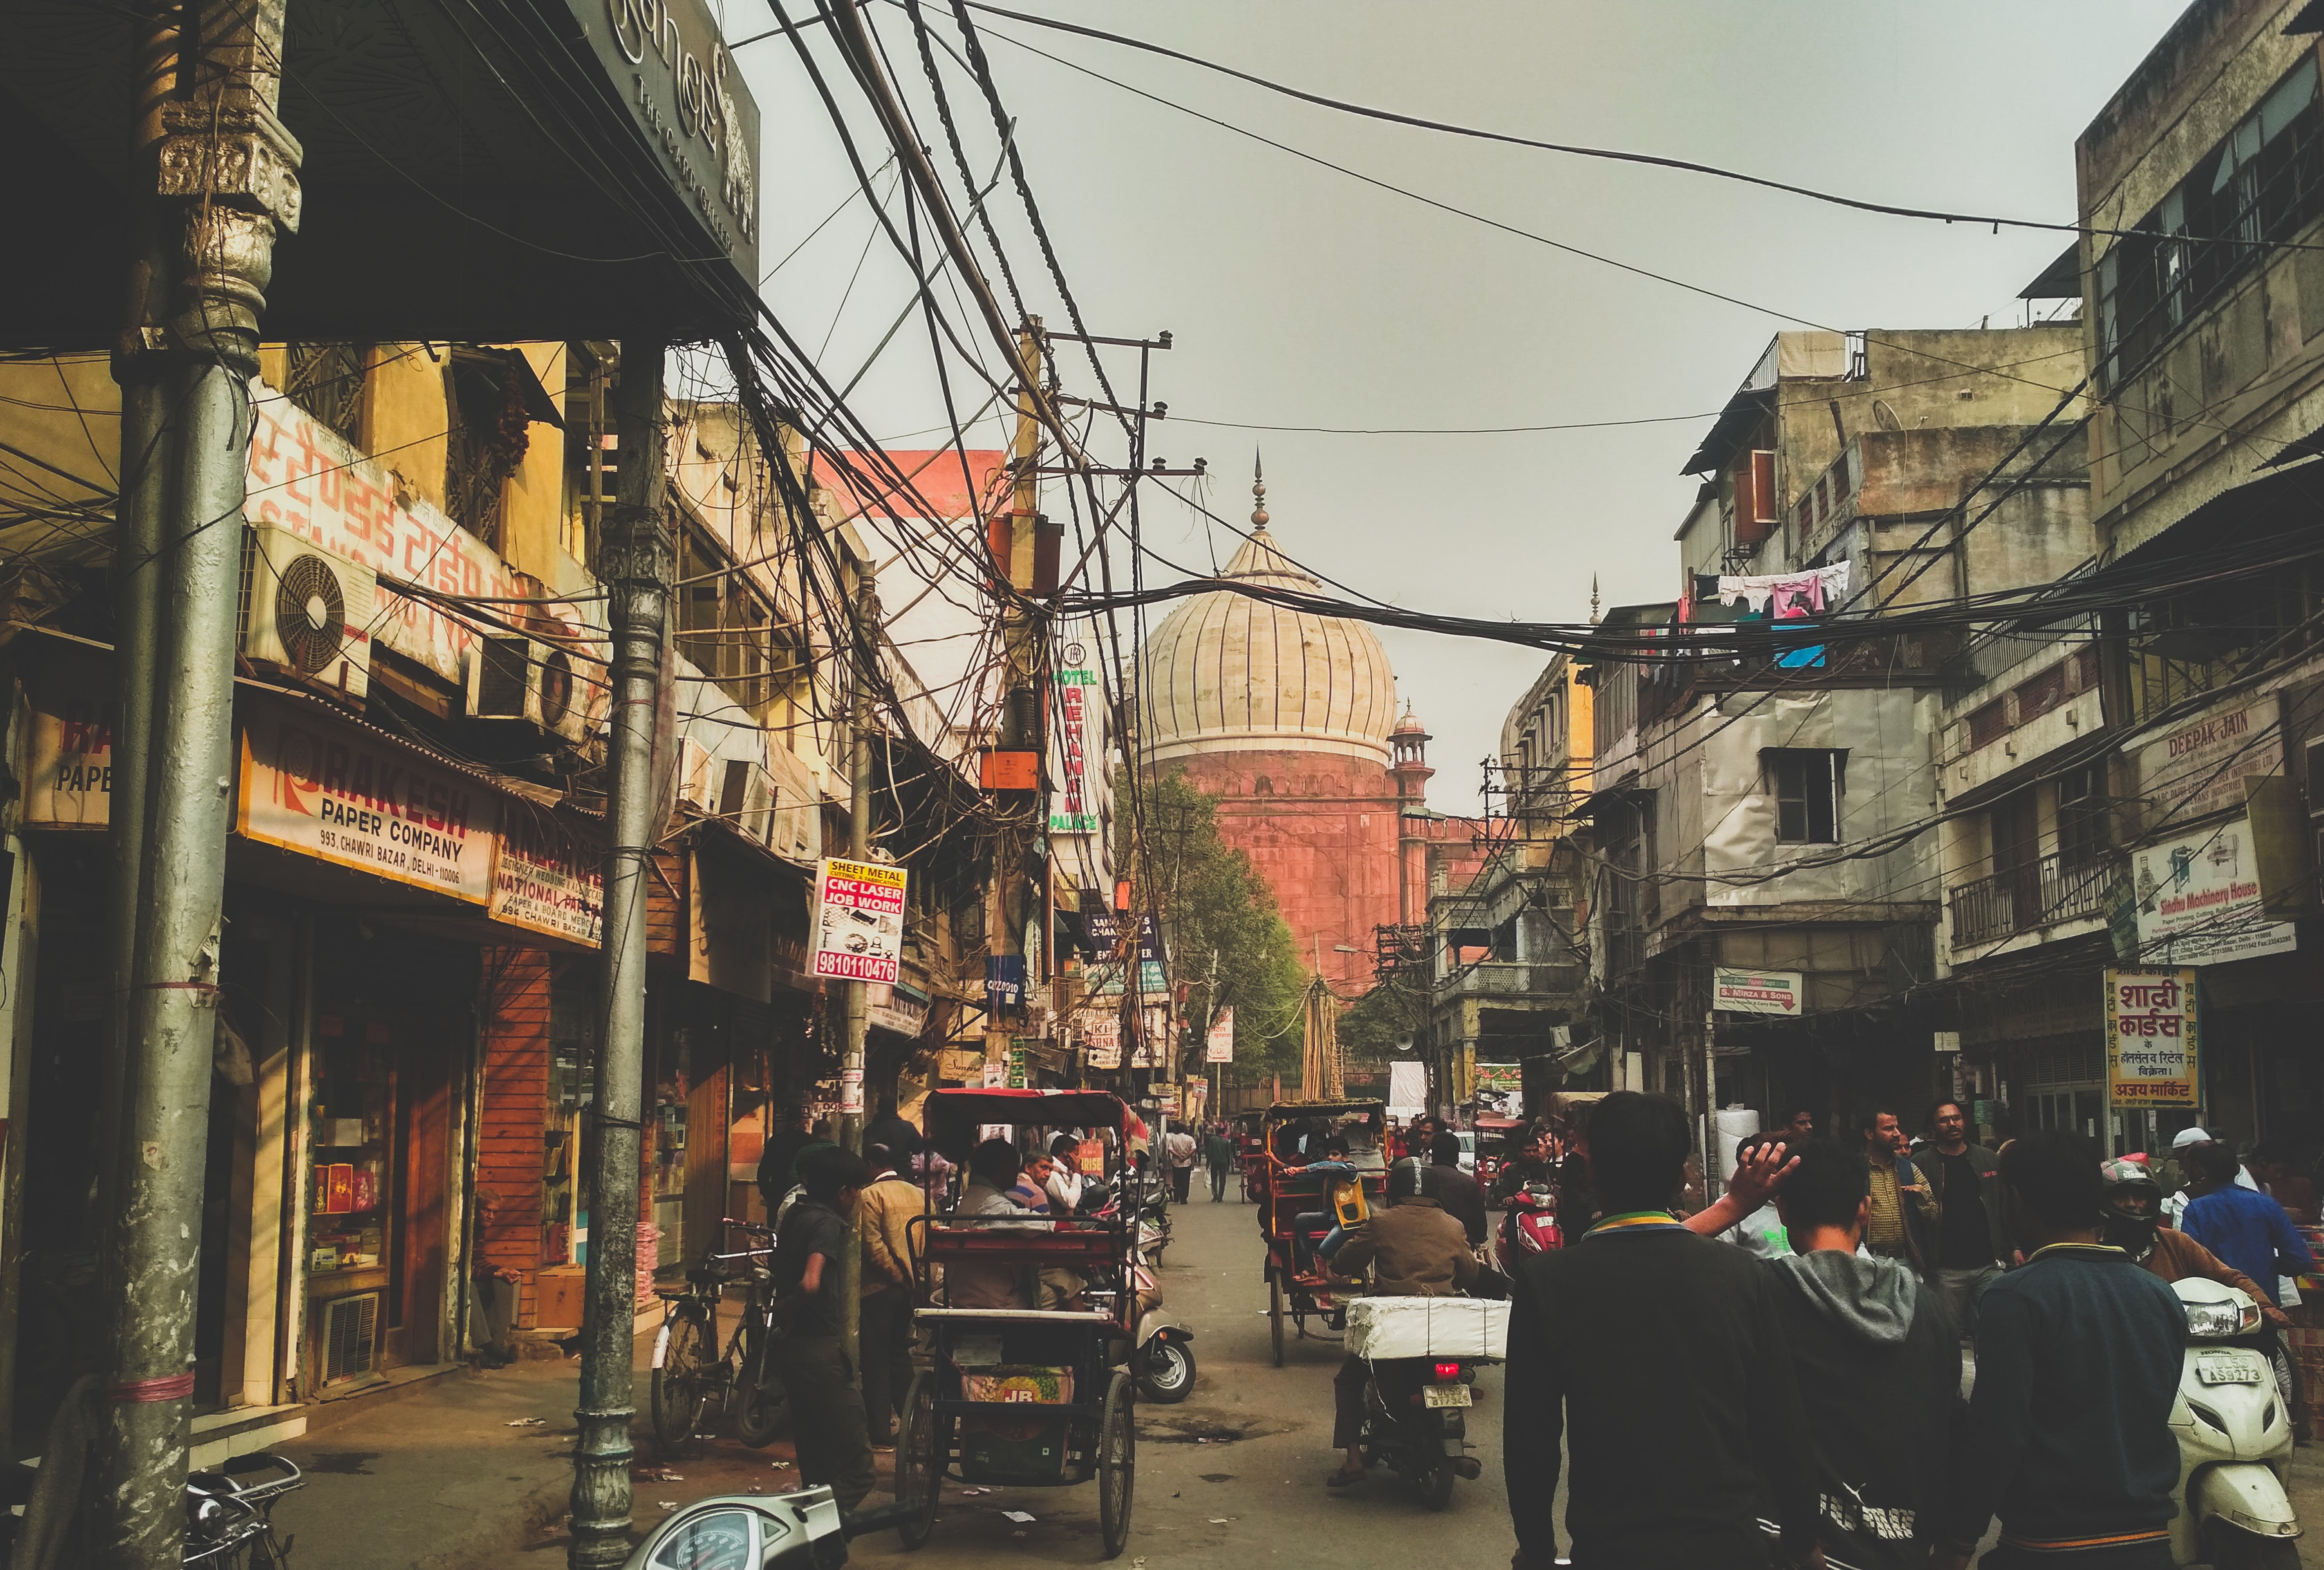 Old Delhi, Chandni Chowk, Things to do in Delhi